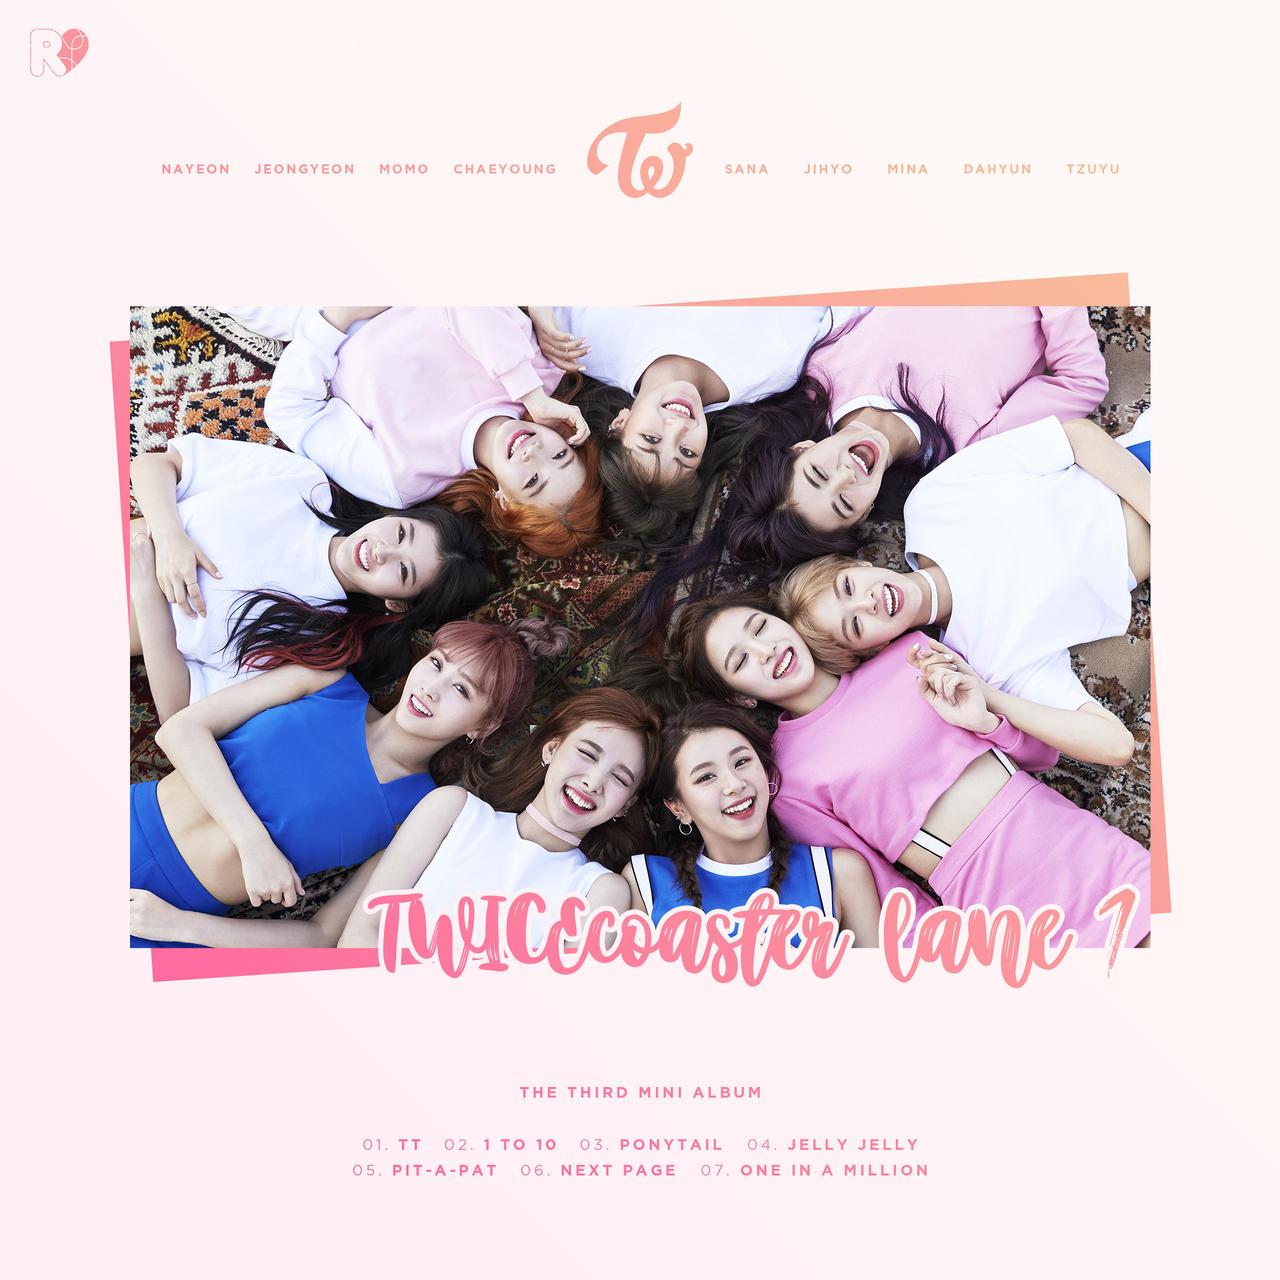 Twice Twicecoaster Lane 1 Album Cover By Areumdawokpop On